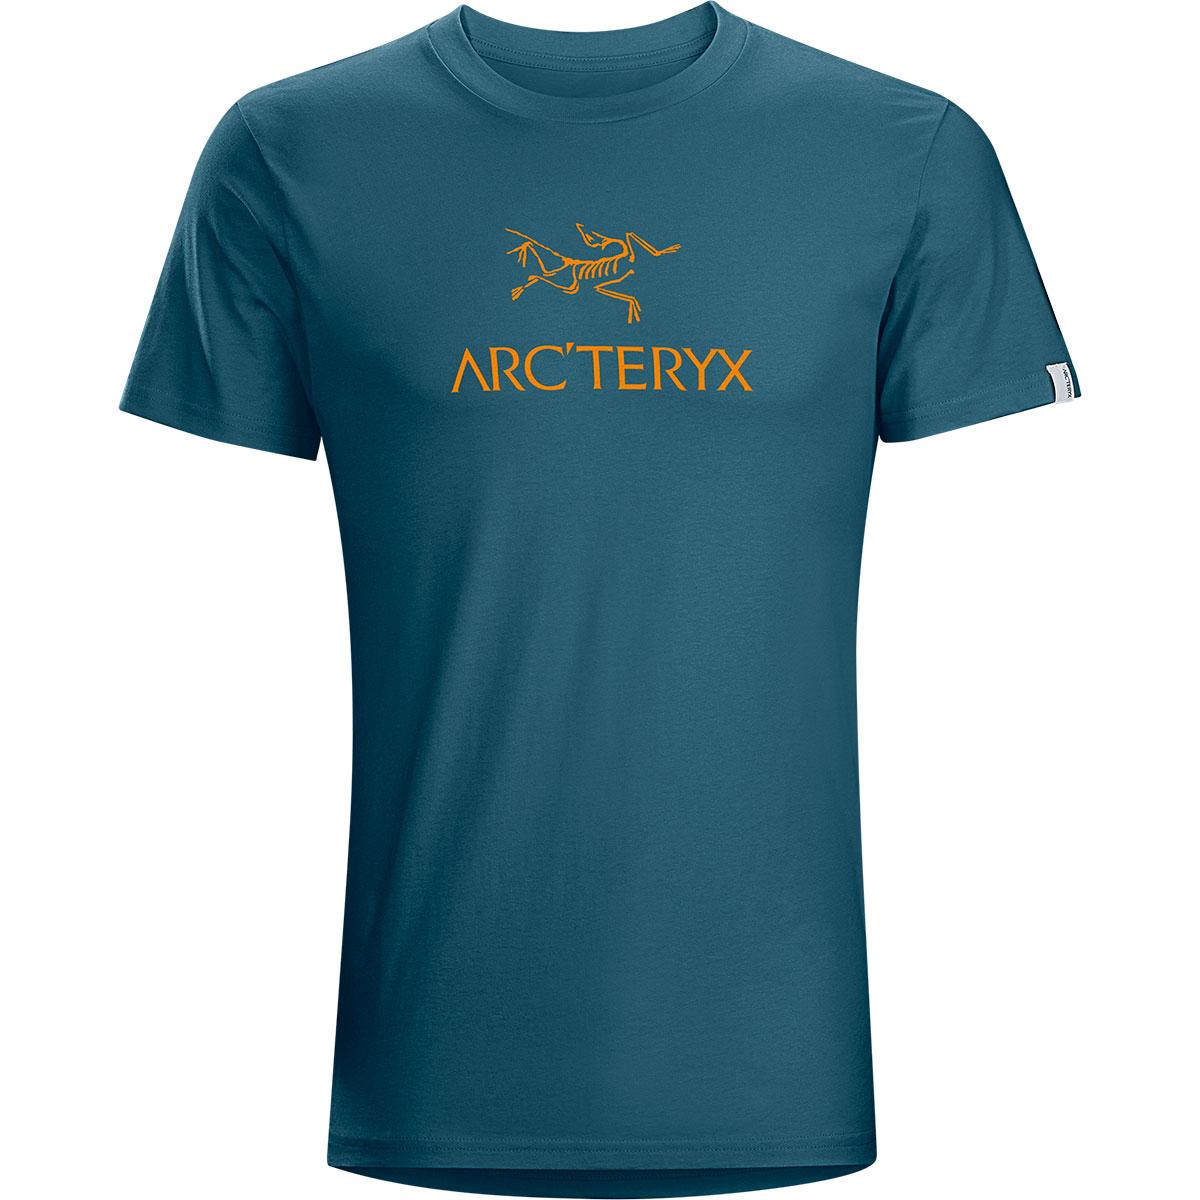 Arc 39 teryx arc 39 word ss t shirt men 39 s lifestyle casual for Arcteryx arc word t shirt